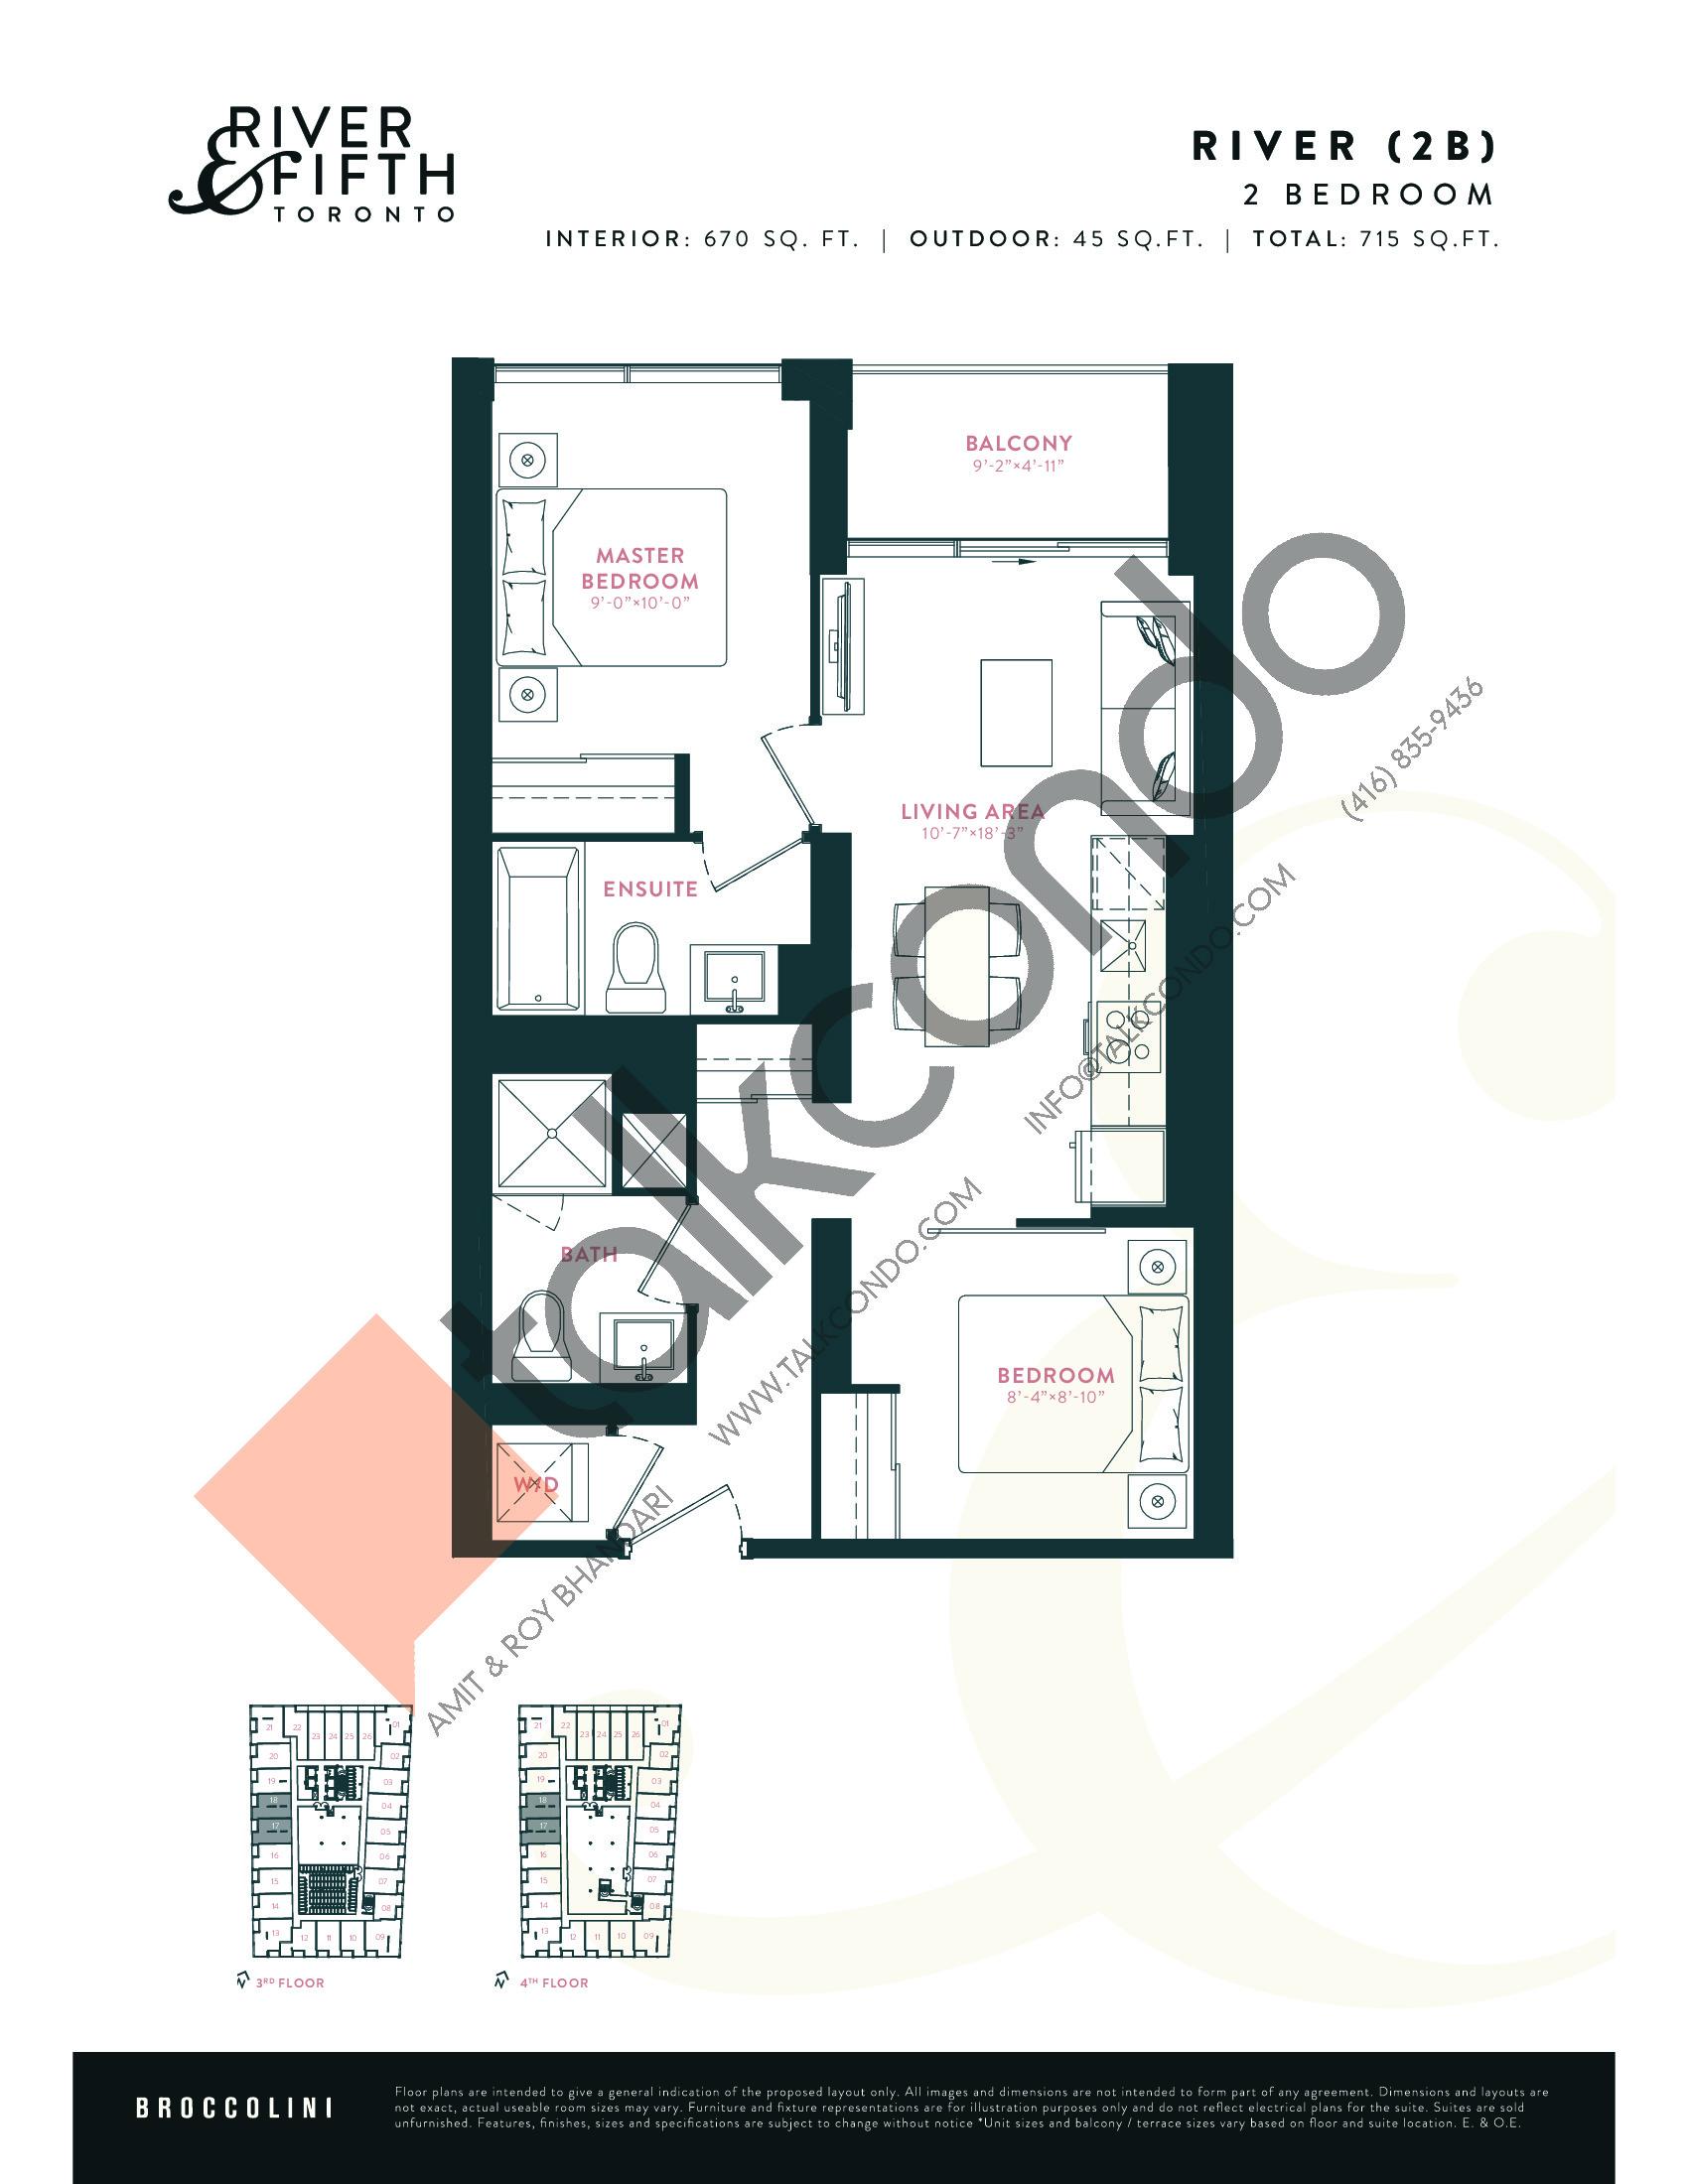 River (2B) Floor Plan at River & Fifth Condos - 670 sq.ft